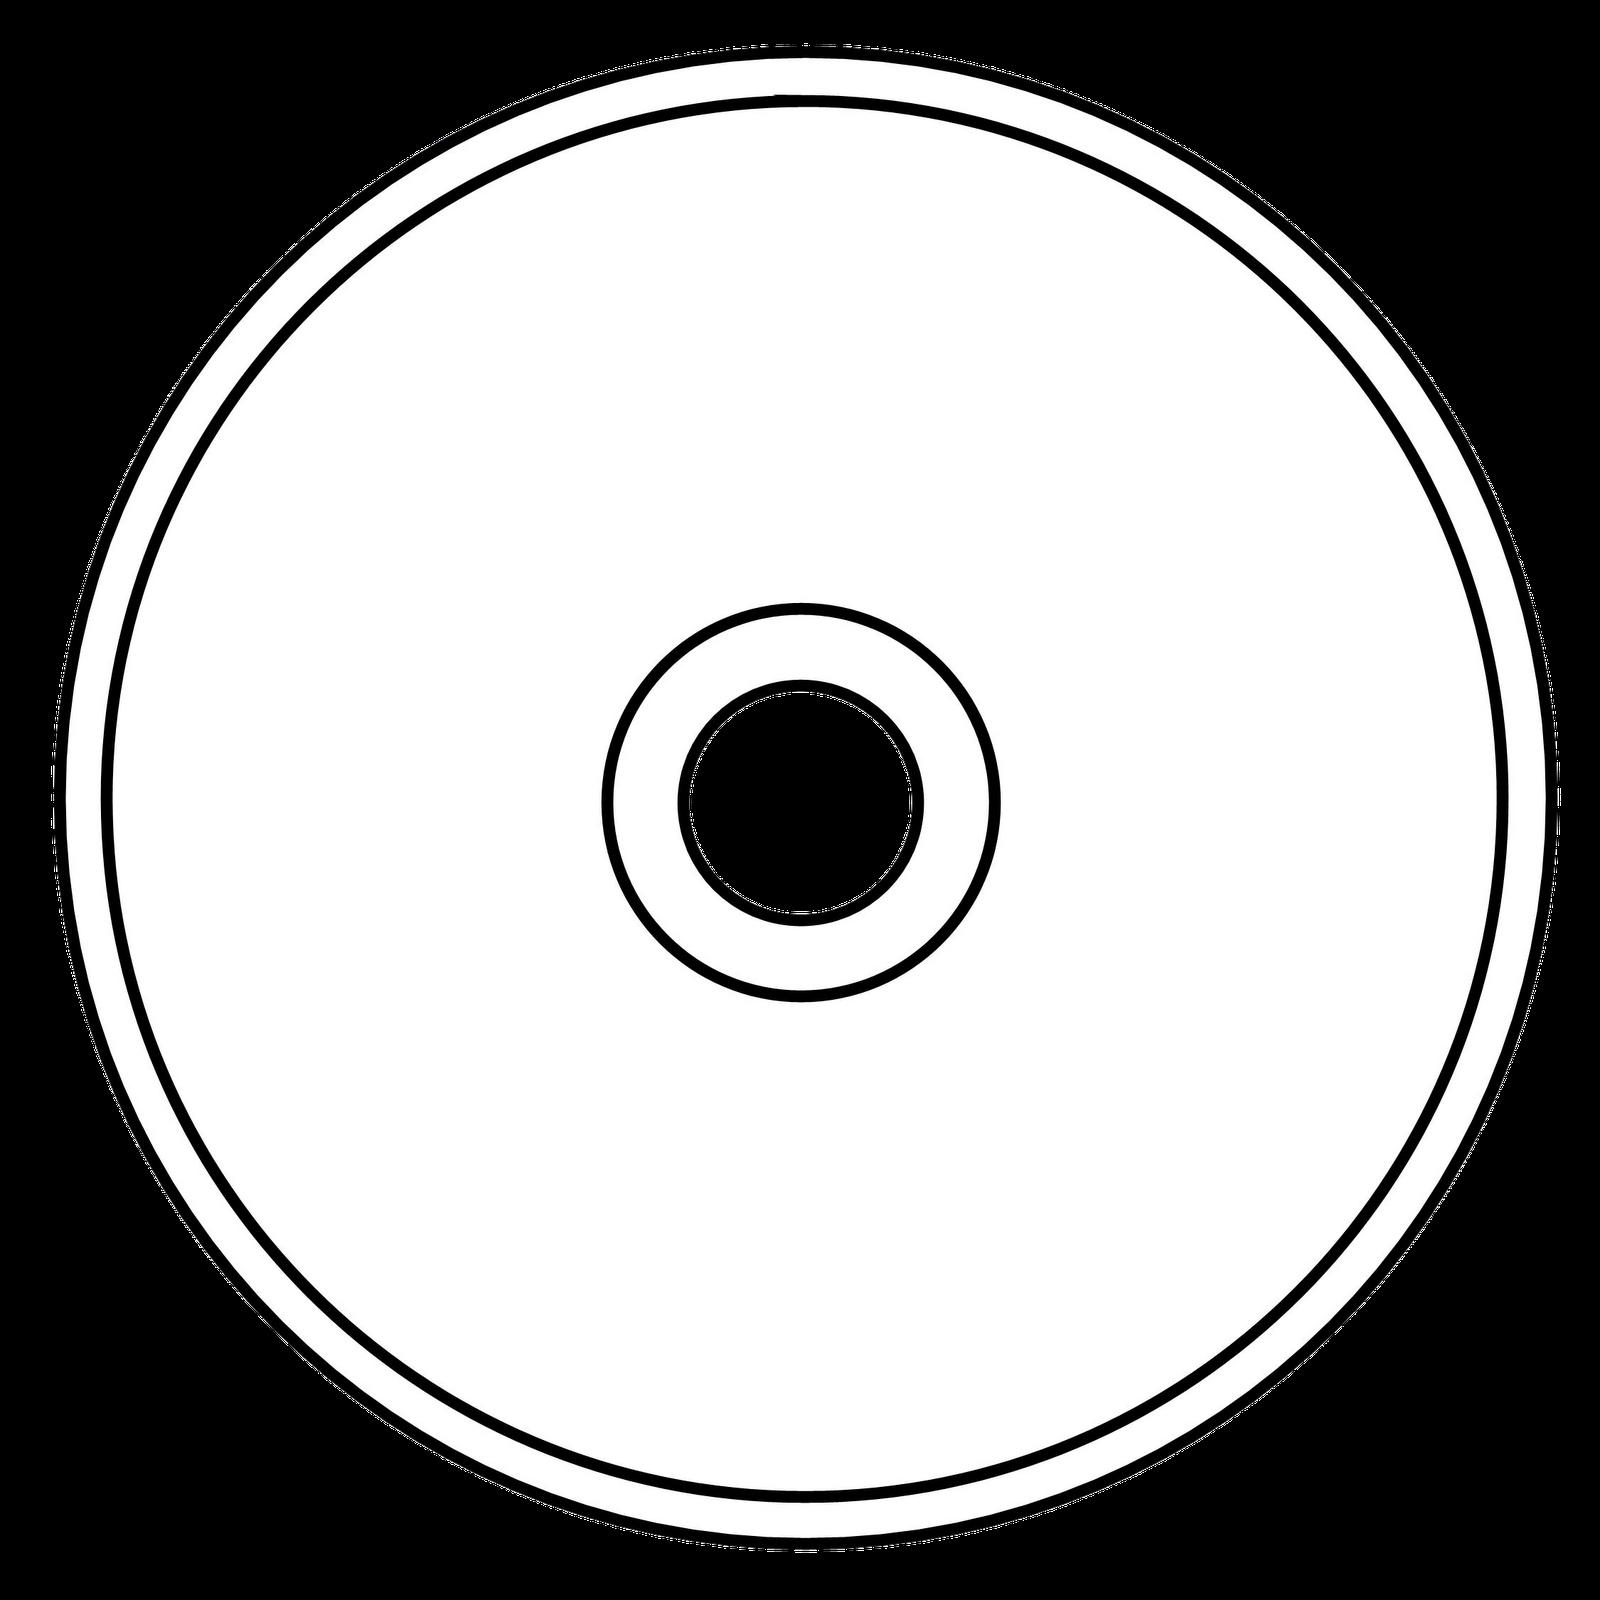 free dvd logo clip art - photo #48